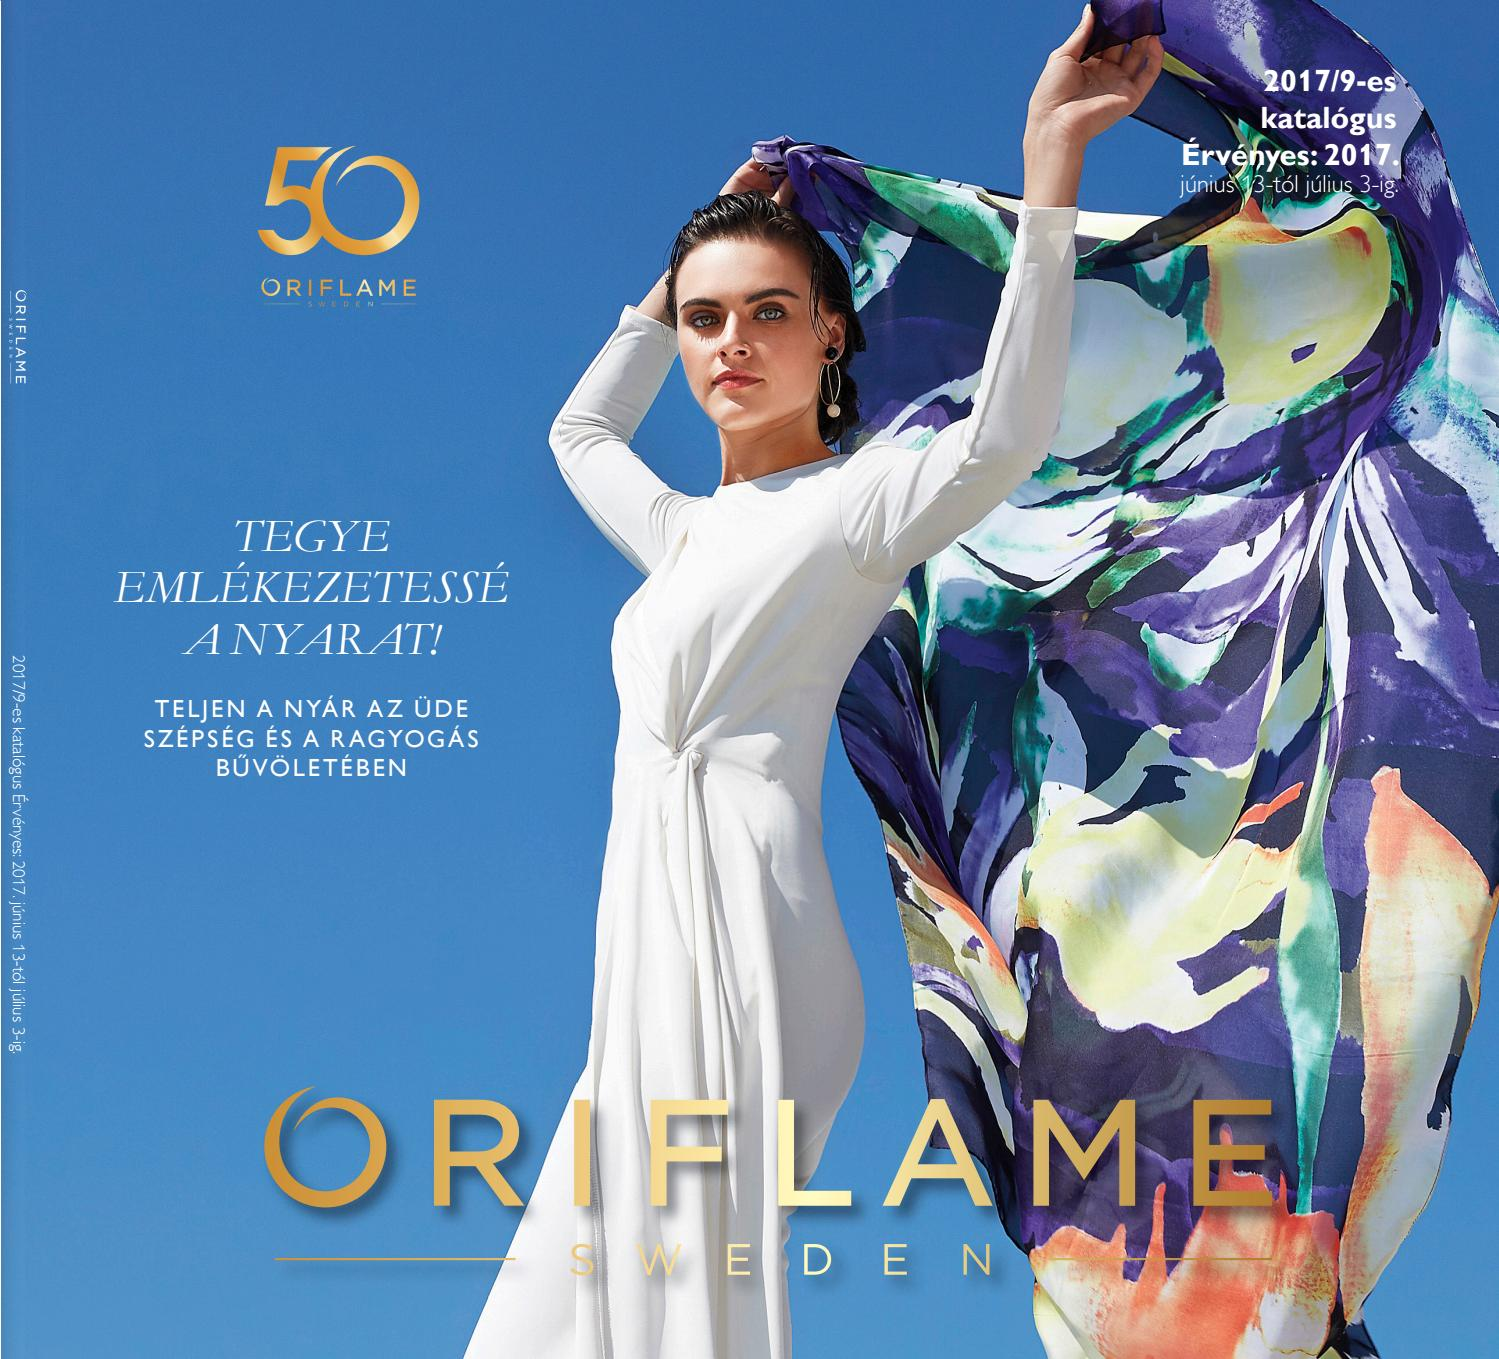 Oriflame 2017 9 es katalógus by Andrea Molnar-Rozvadszky - issuu a6570bfa17